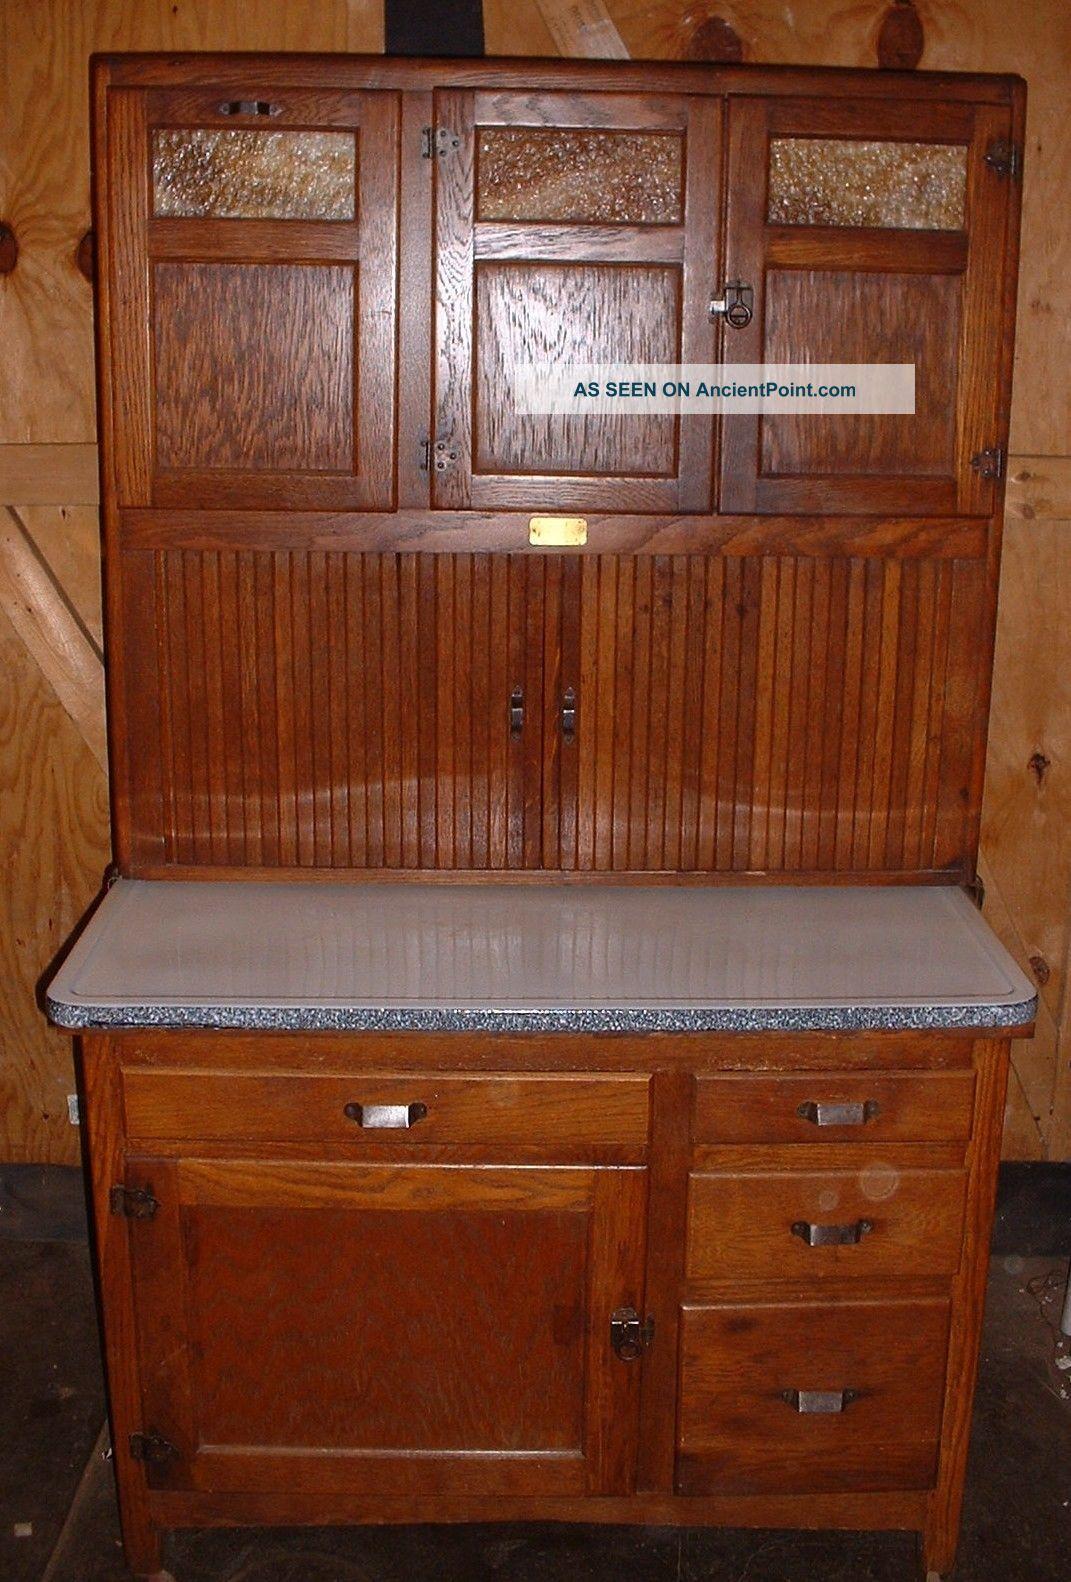 Rare Antique Seller ' S Oak Hoosier Kitchen Cabinet Kitcheneed All In One Slag 1800-1899 photo